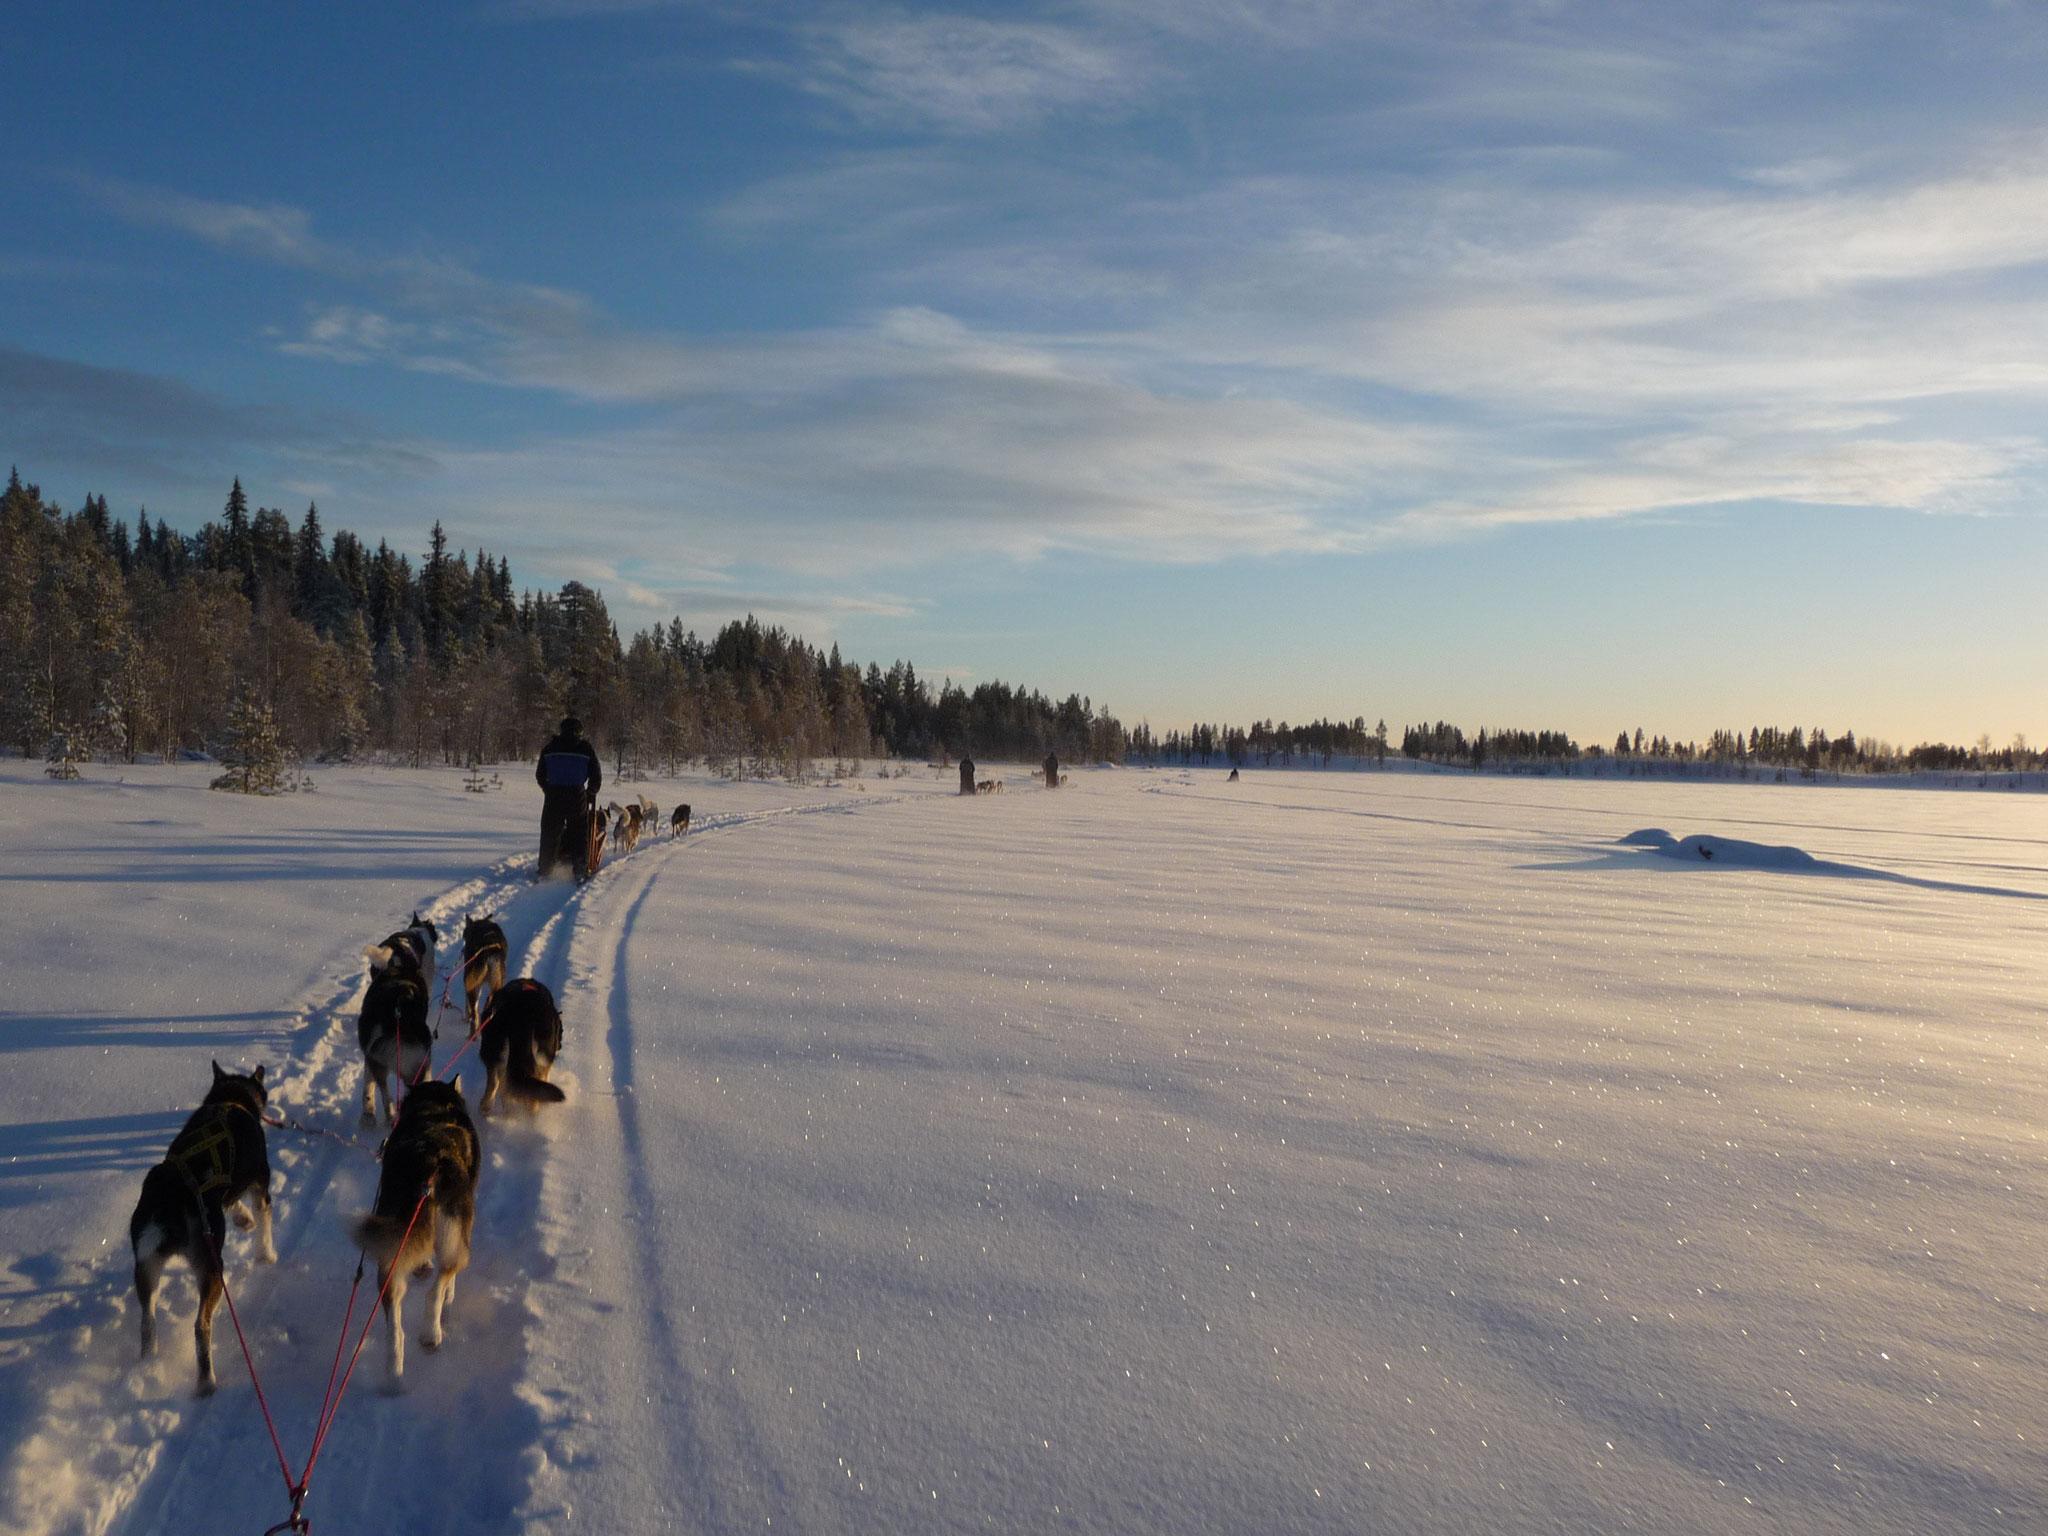 Huskygespanne auf dem zugefrorenem  Fluss